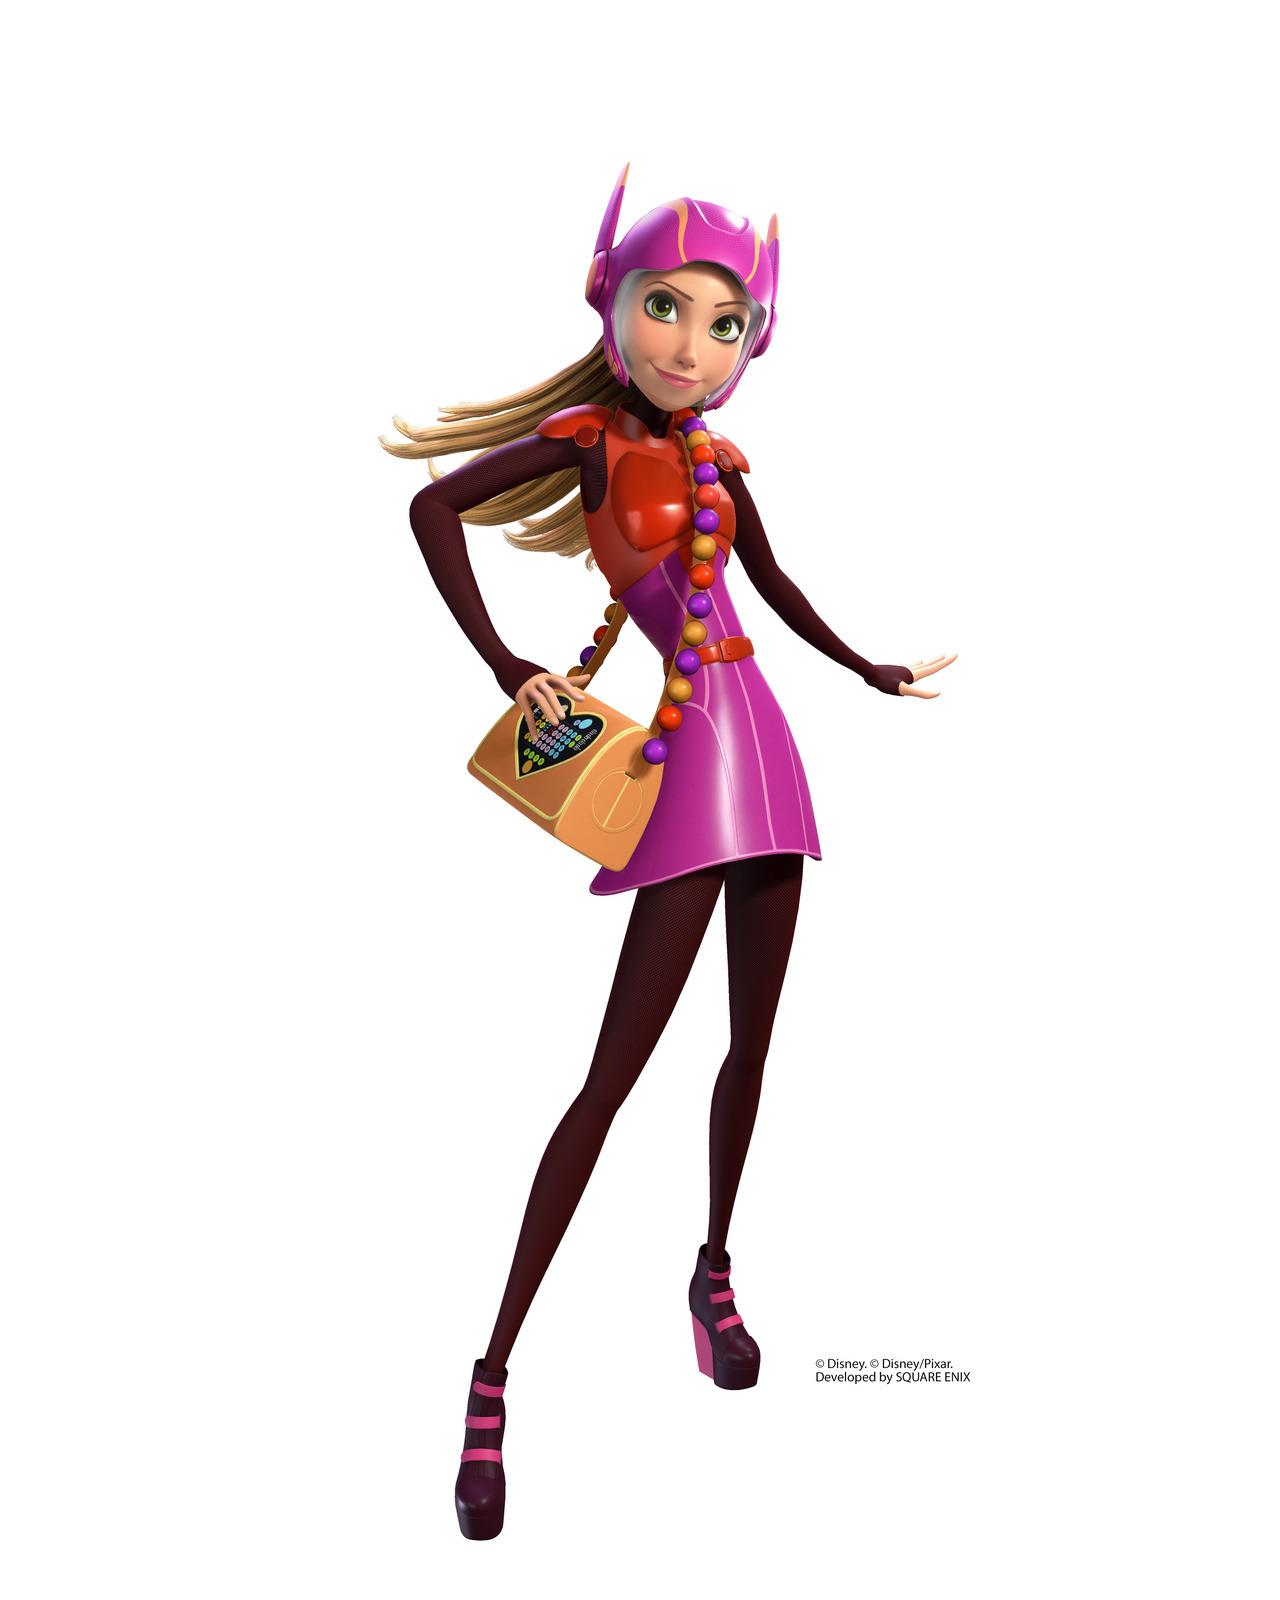 Pin by Disney Girl on Big Hero 6 | Pinterest | Big Hero 6, Hero 6